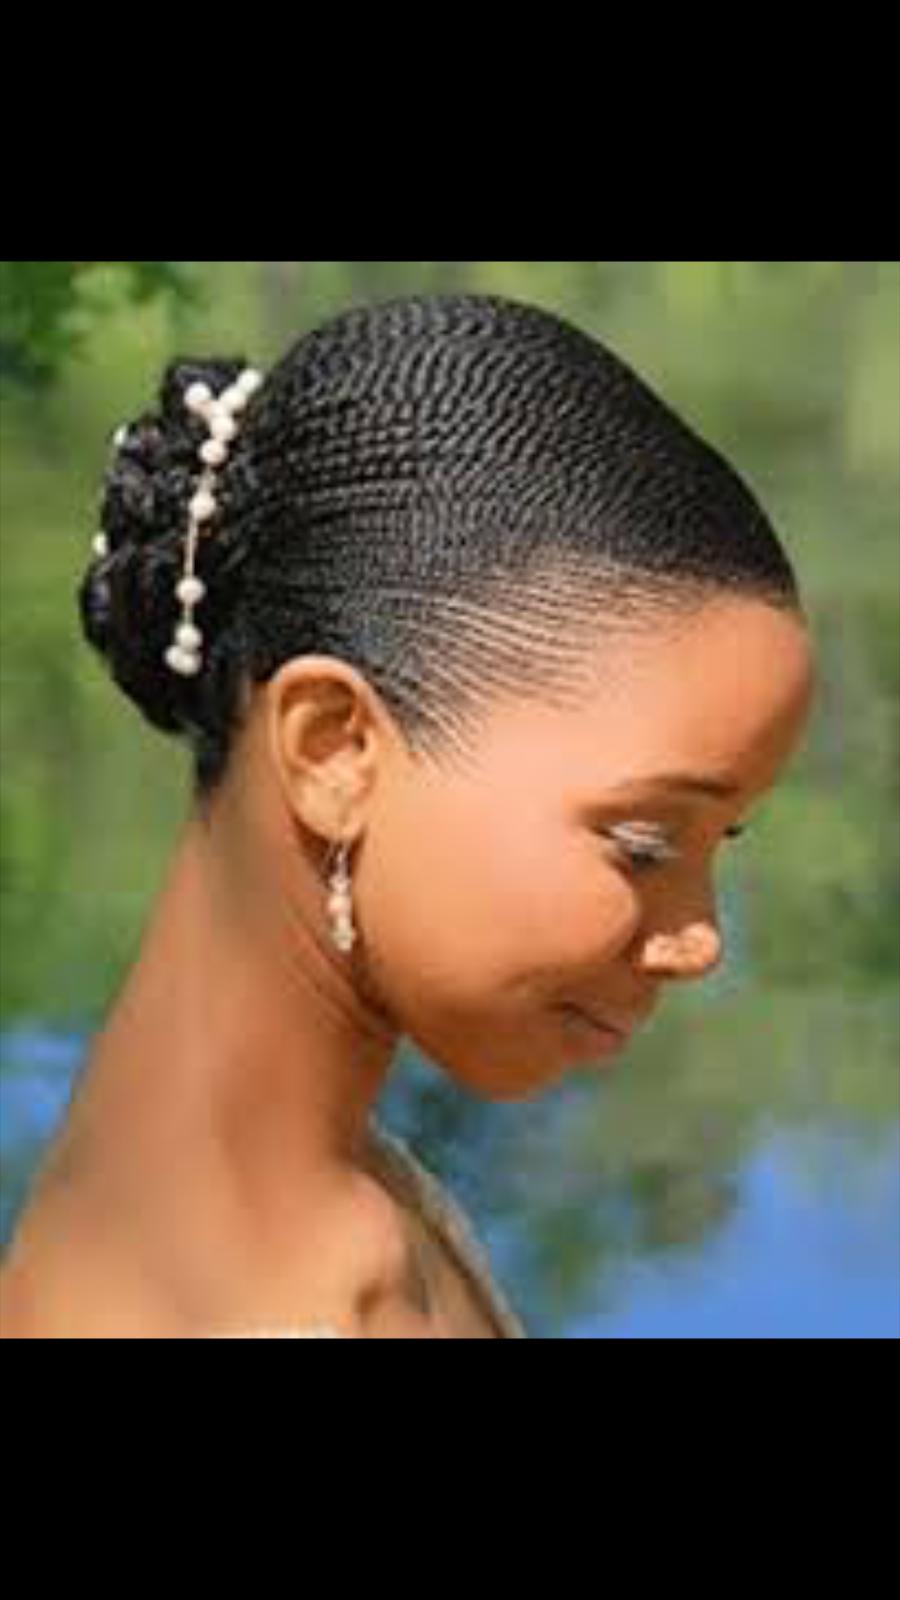 Giseles African Hair Braiding - hair care  | Photo 3 of 3 | Address: 406 Waters Cove Ct, Stafford, VA 22554, USA | Phone: (804) 332-7389